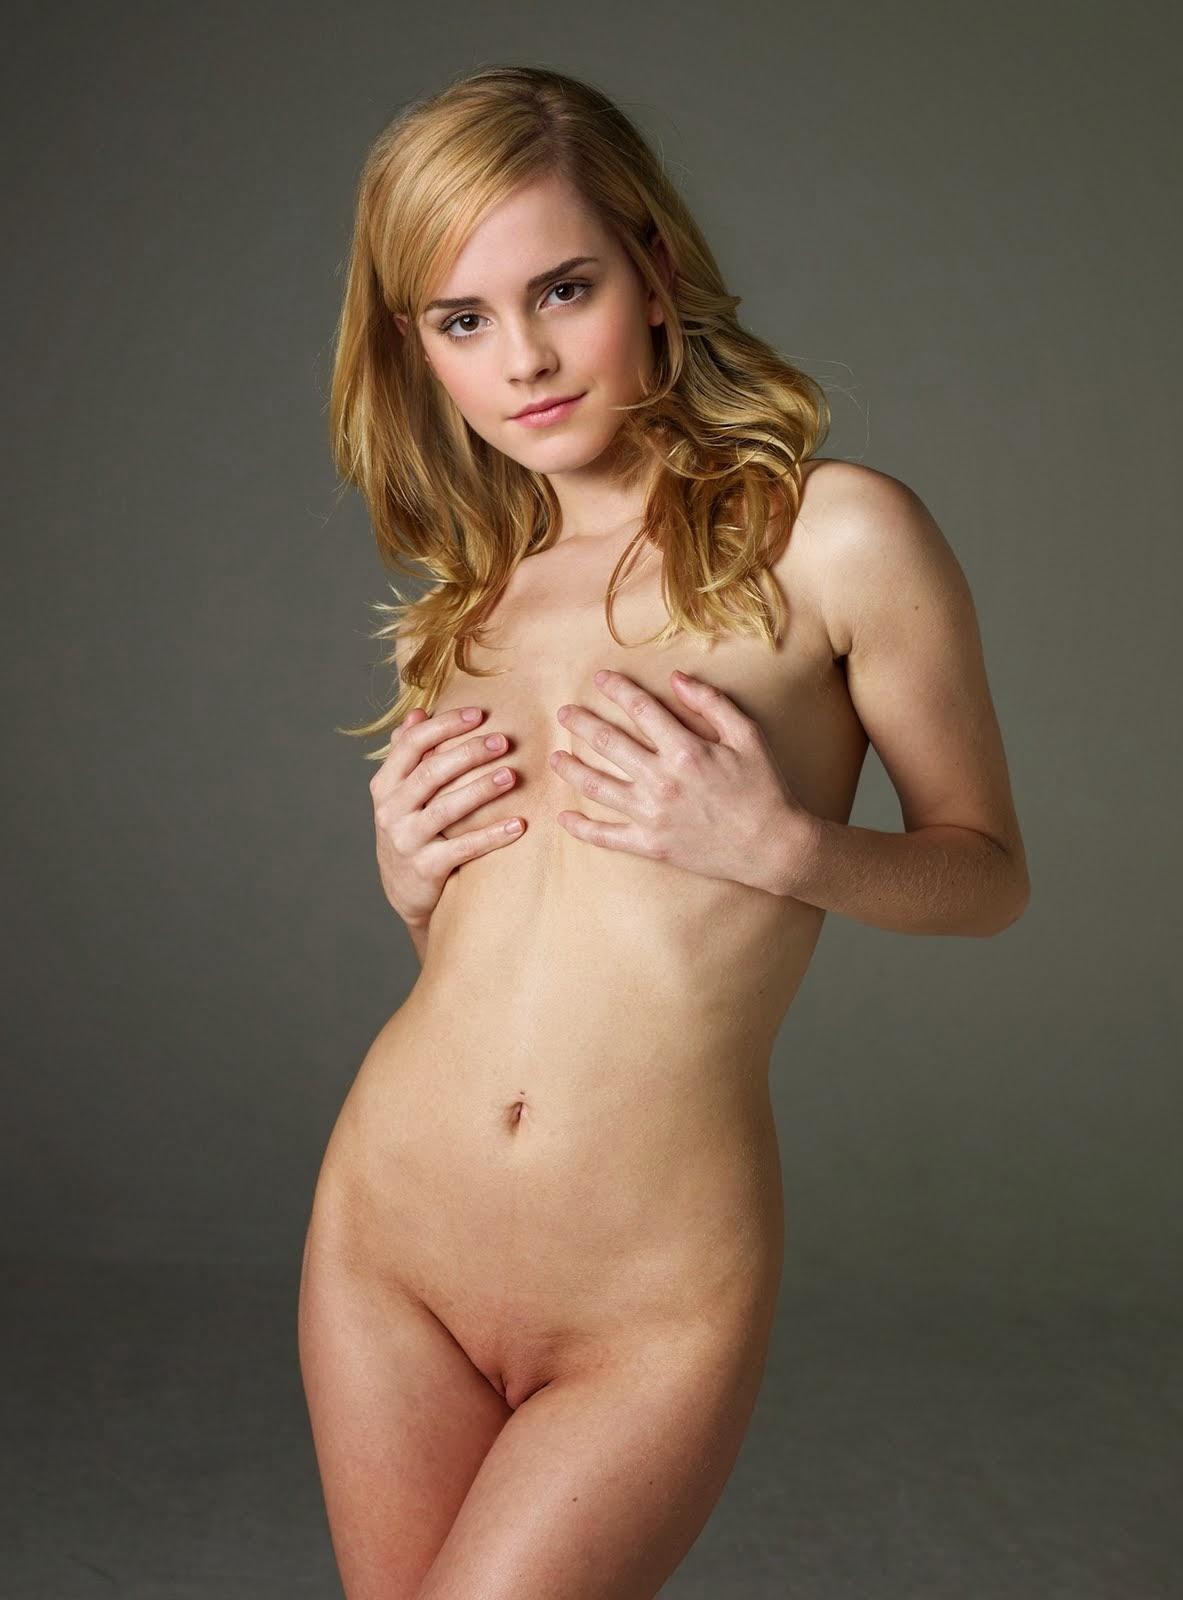 Free Nude Pics Of Emma Watson